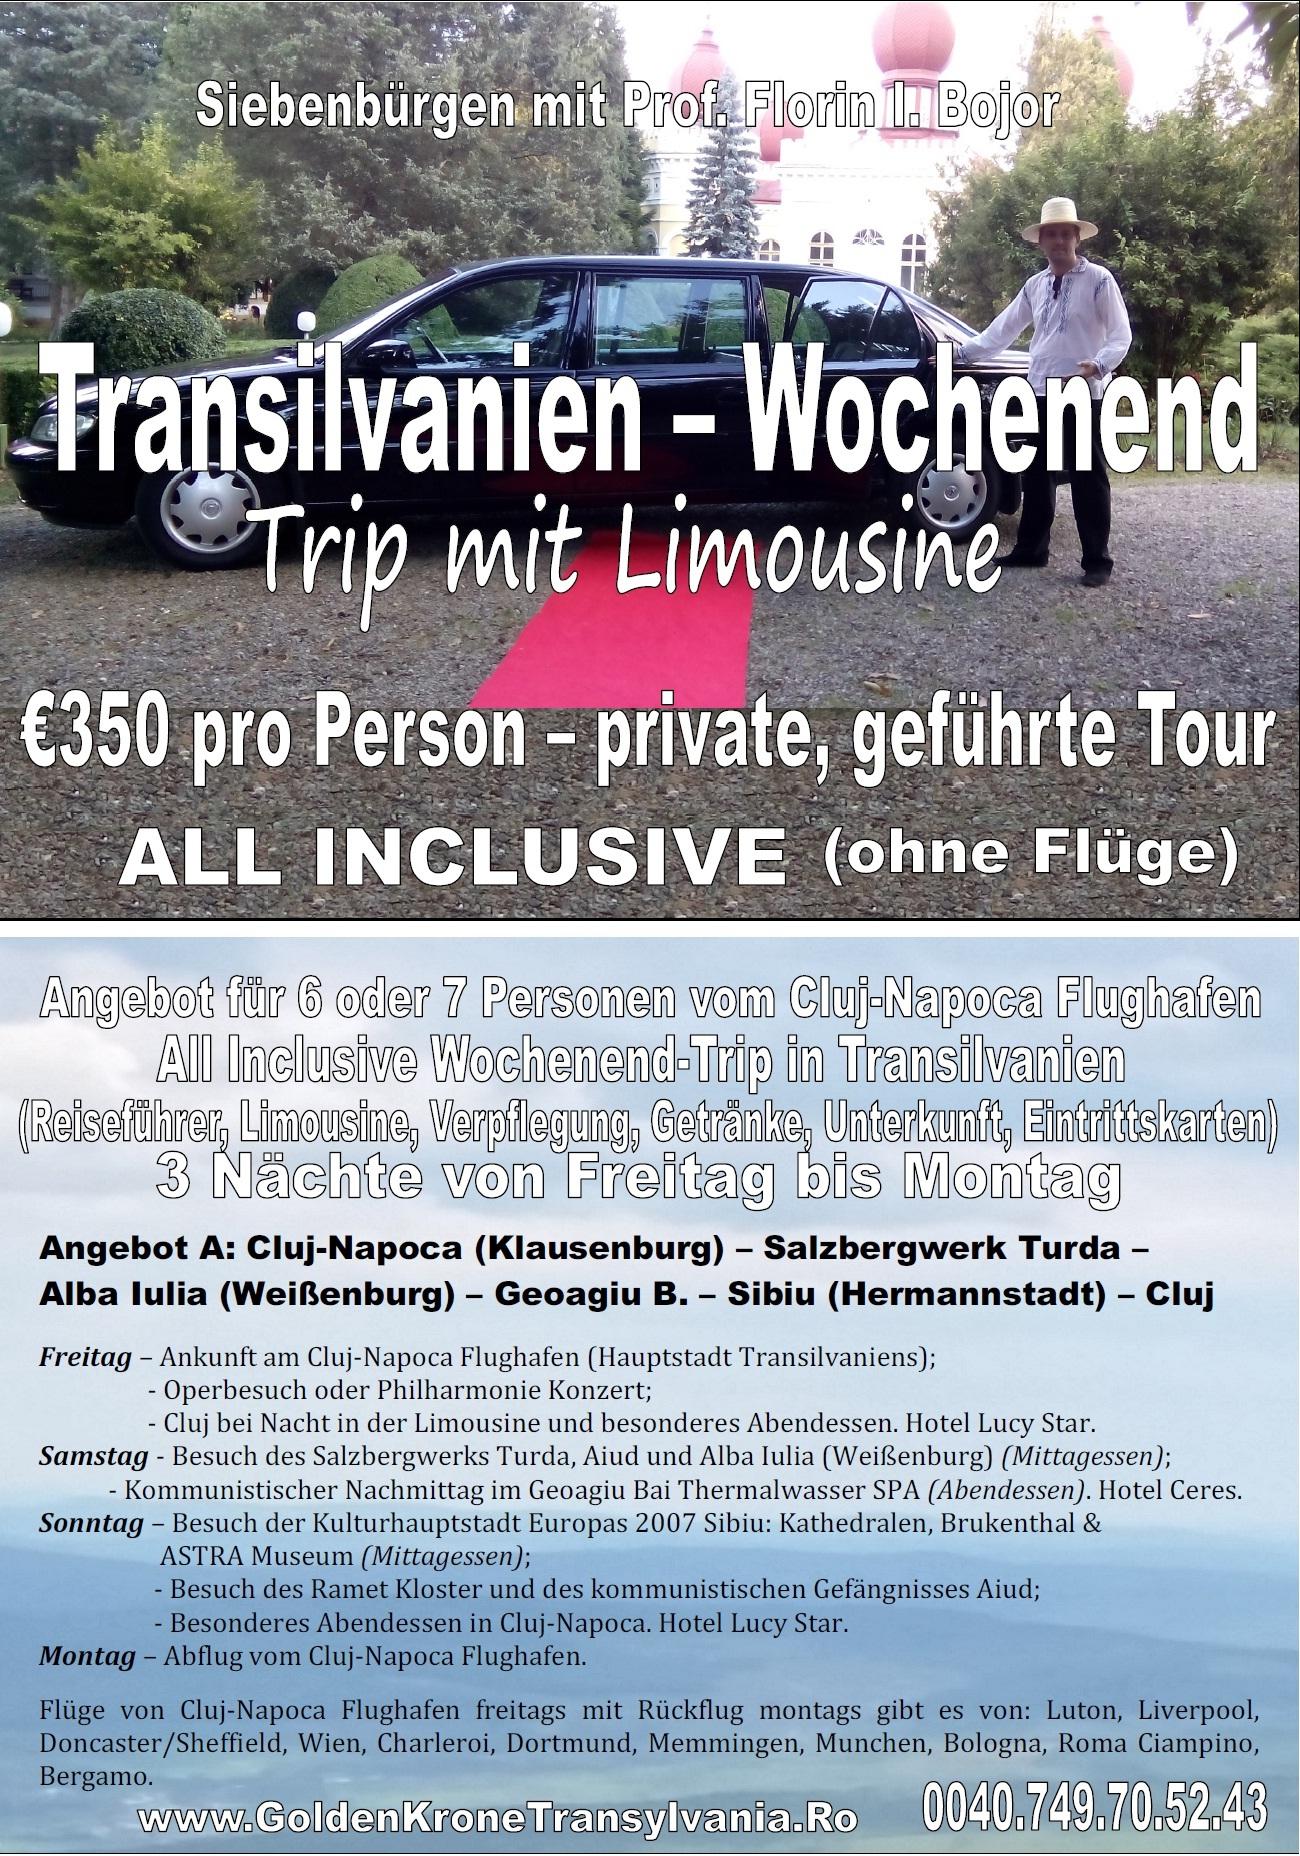 Transylvania Tour Packages